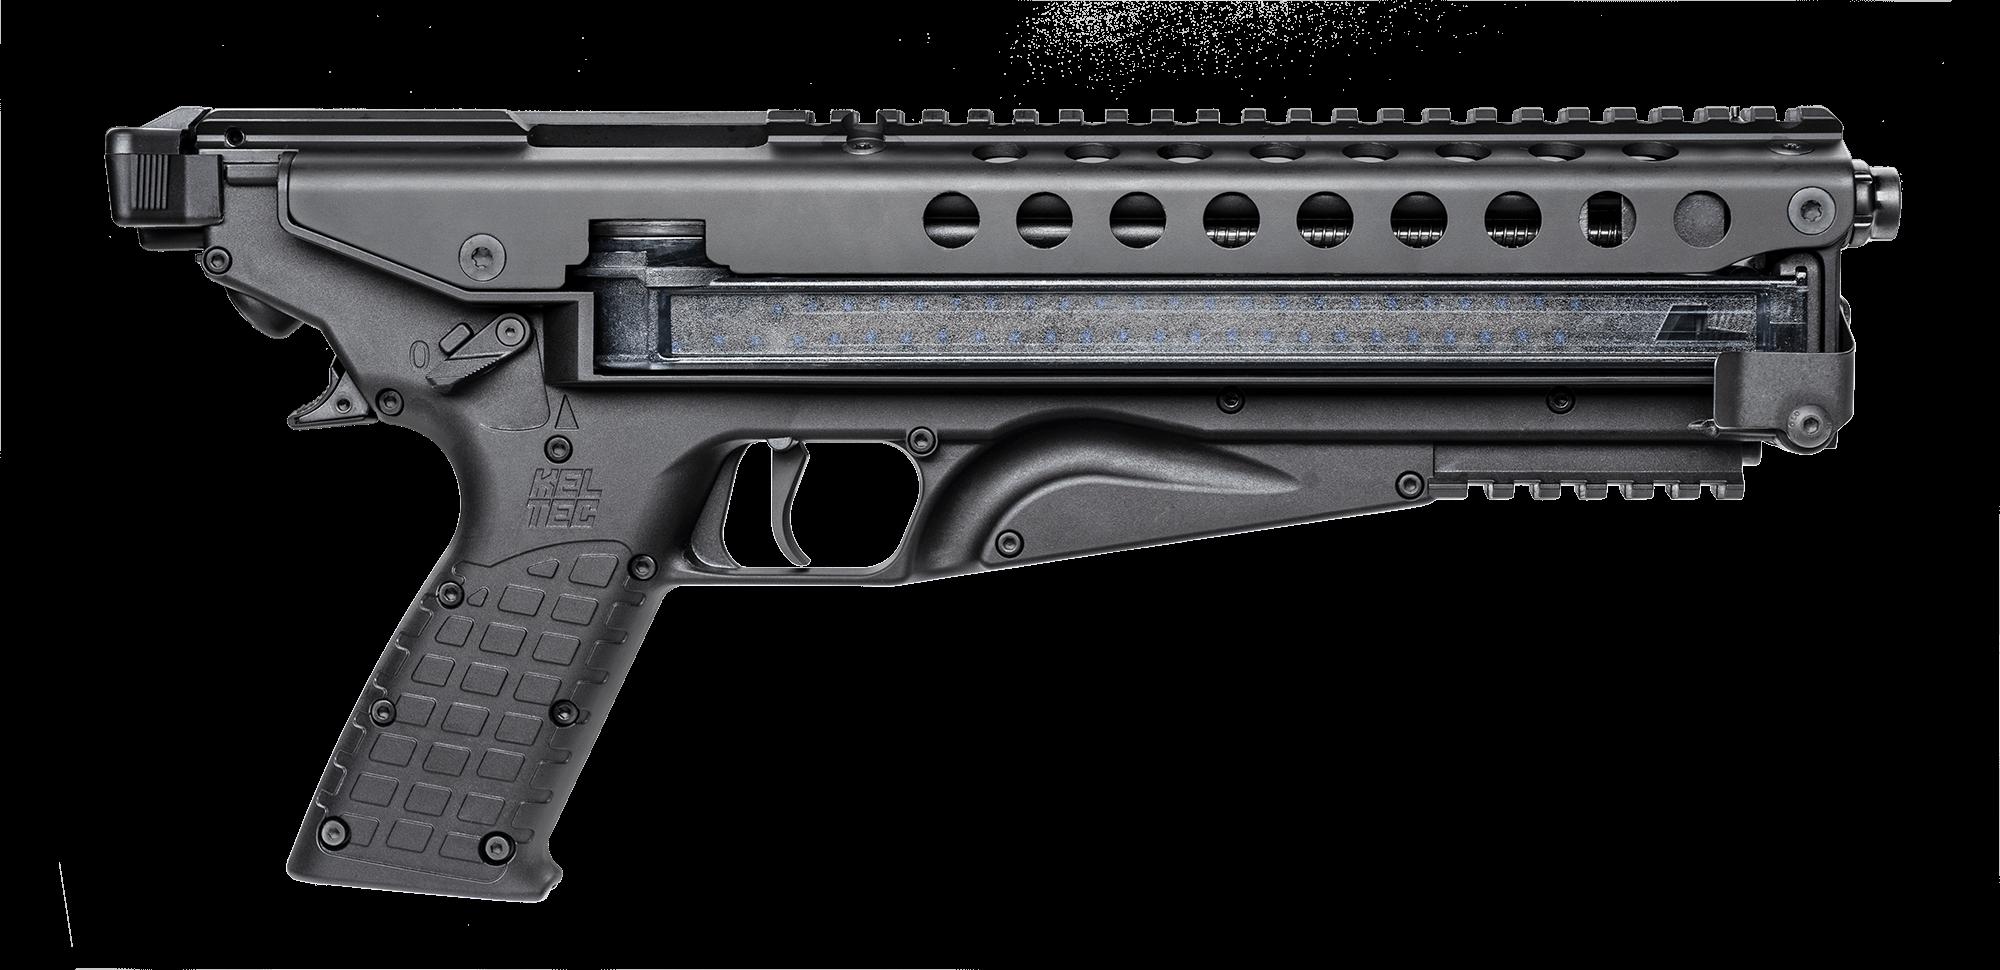 keltec p50 fn p90 magazines 5.7x28mm pistol